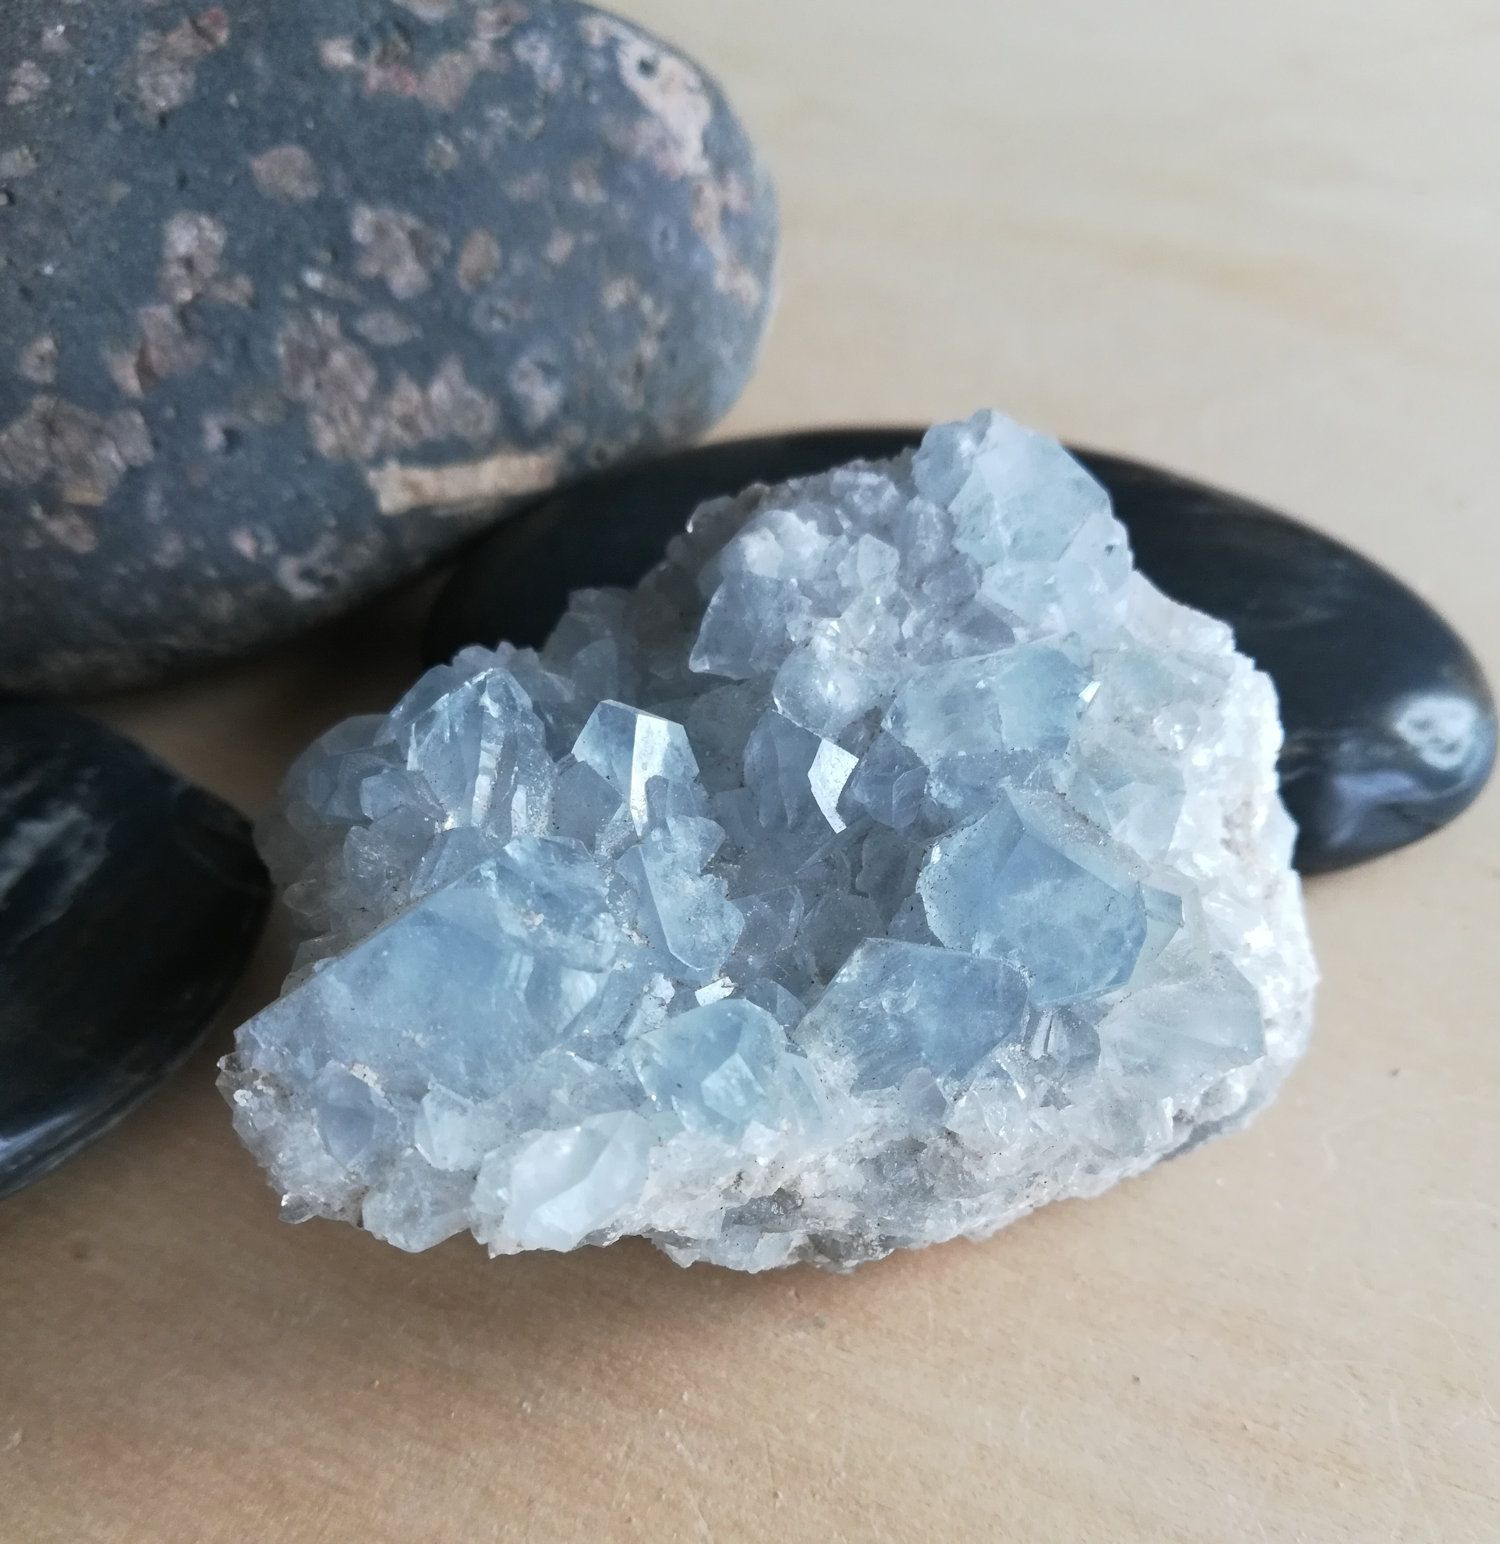 Celestite Crystal Cluster Light Sky Blue Celestine Cluster 3 4 Ounces 96 Grams Mineral Specimen For Sale By Cr Celestite Crystal Crystals Crystal Cluster